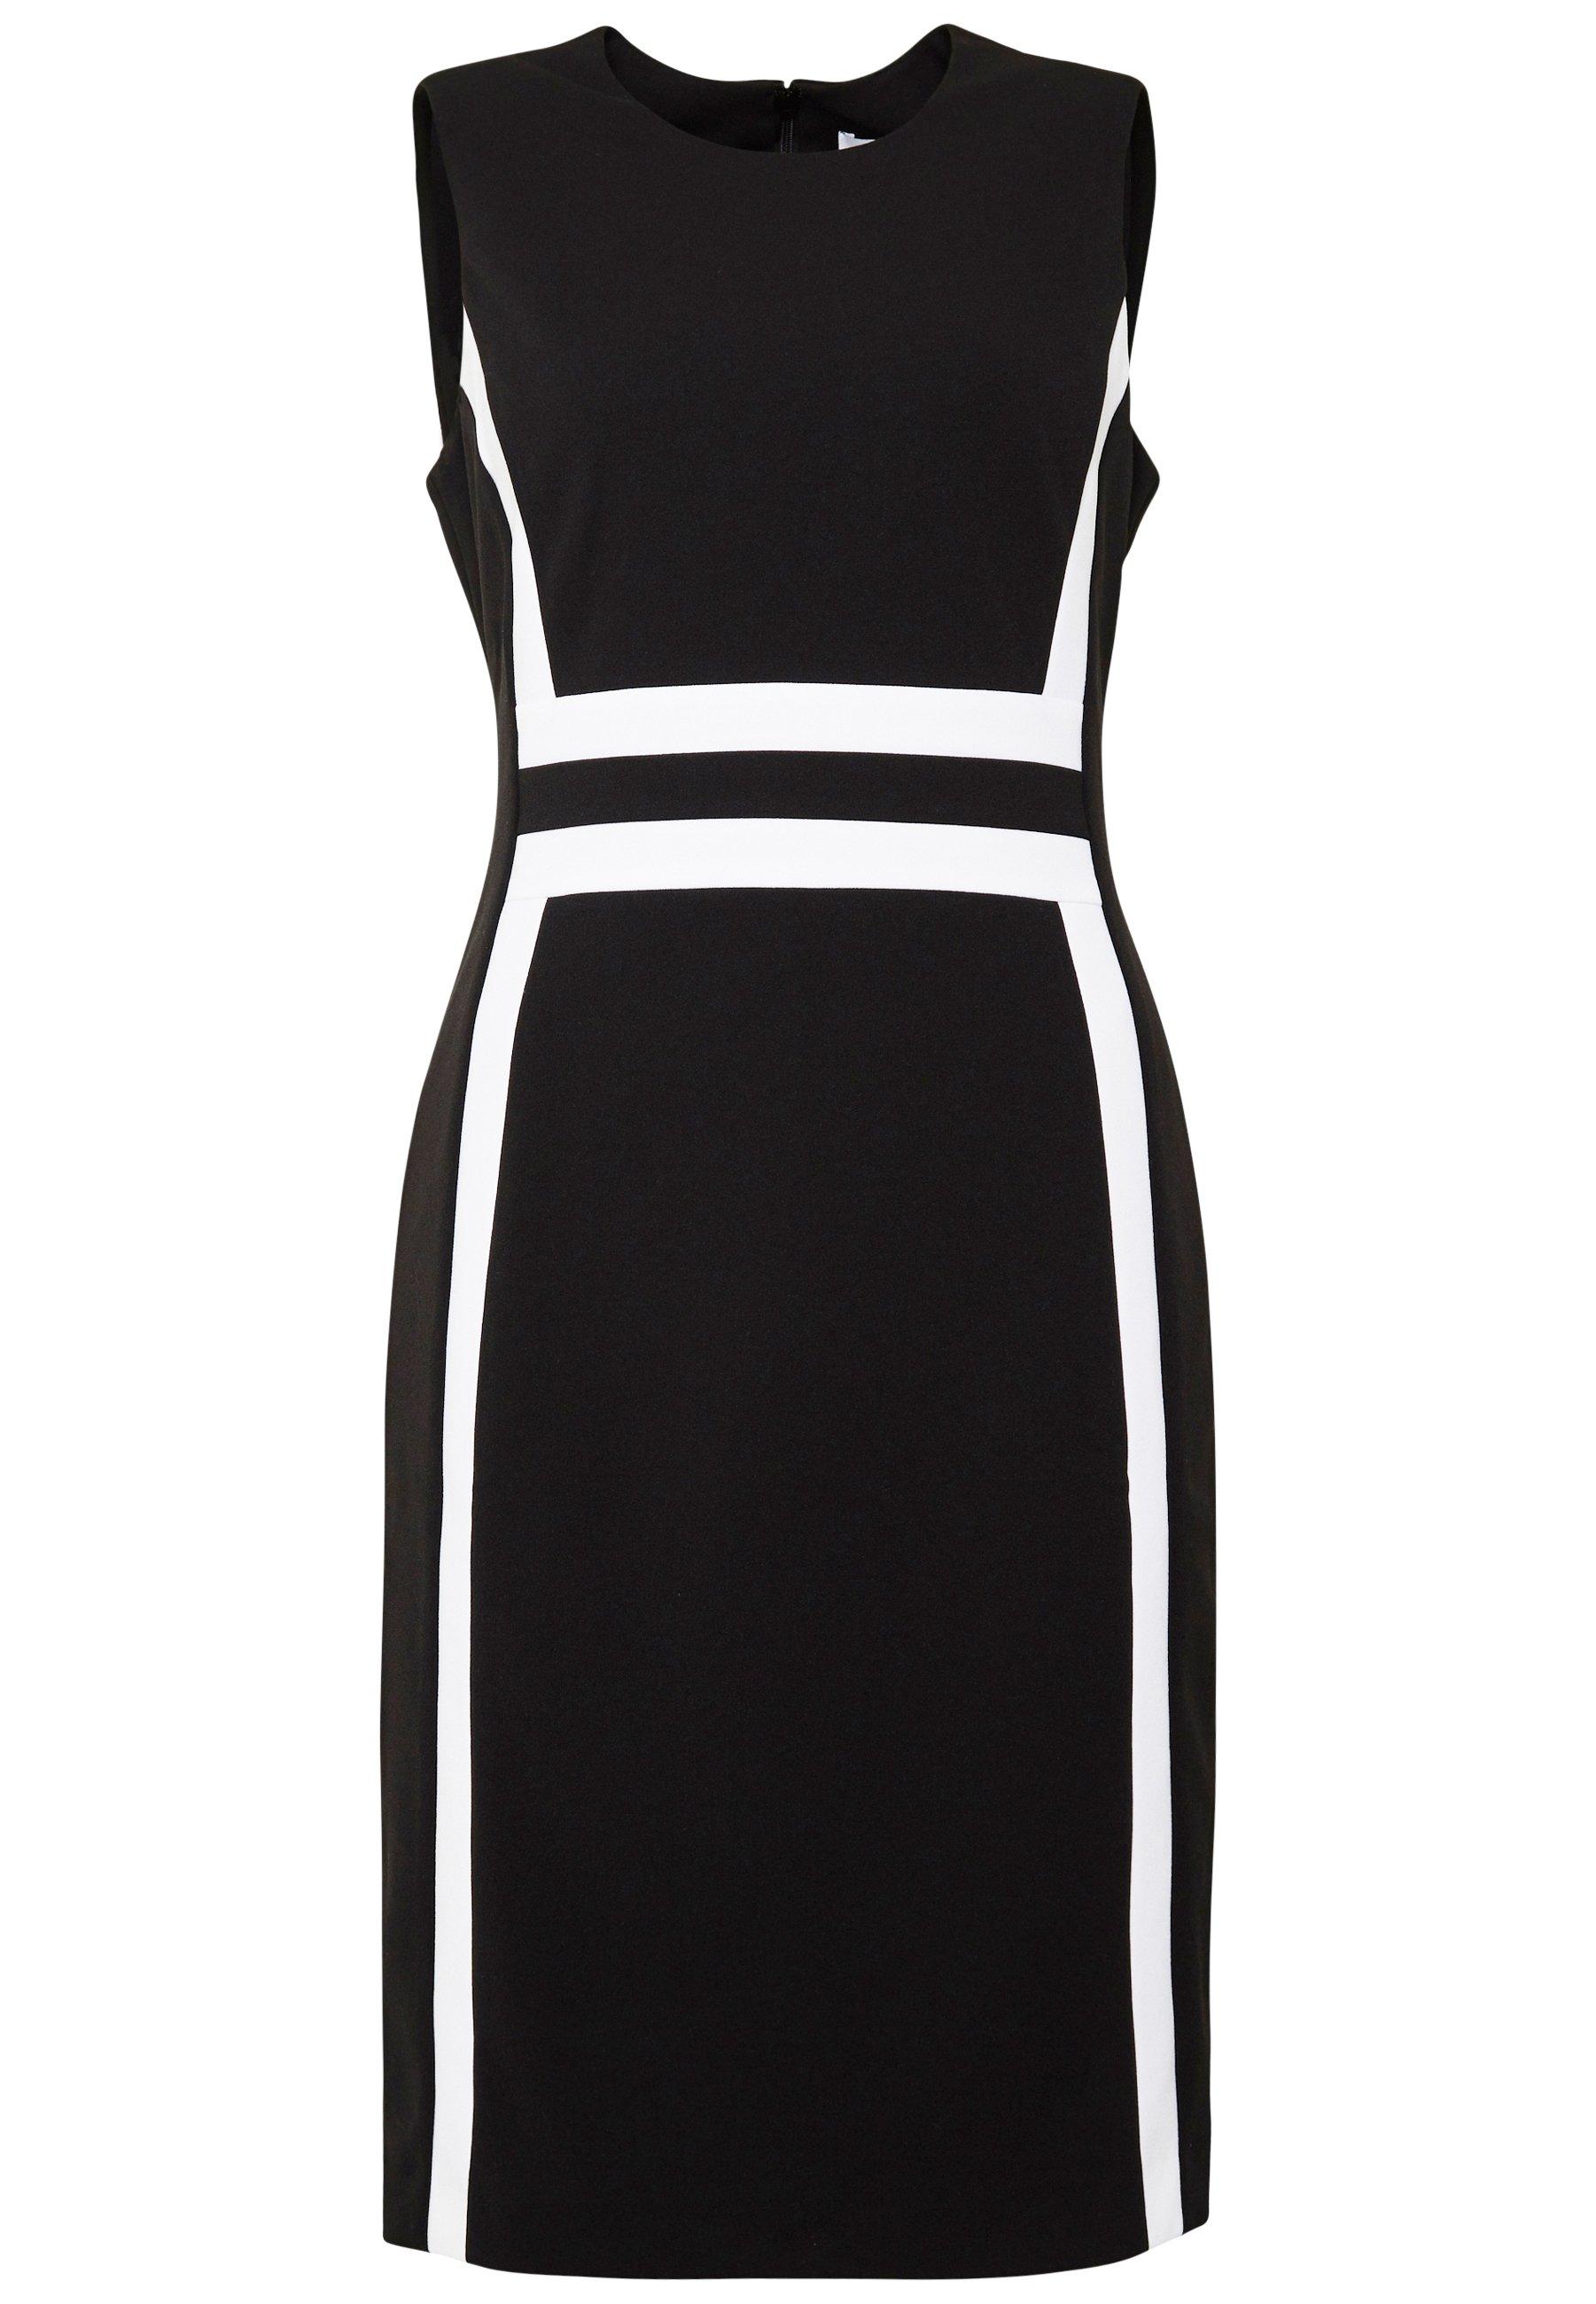 Mujer CONTRAST PANEL DRESS NS - Vestido ligero